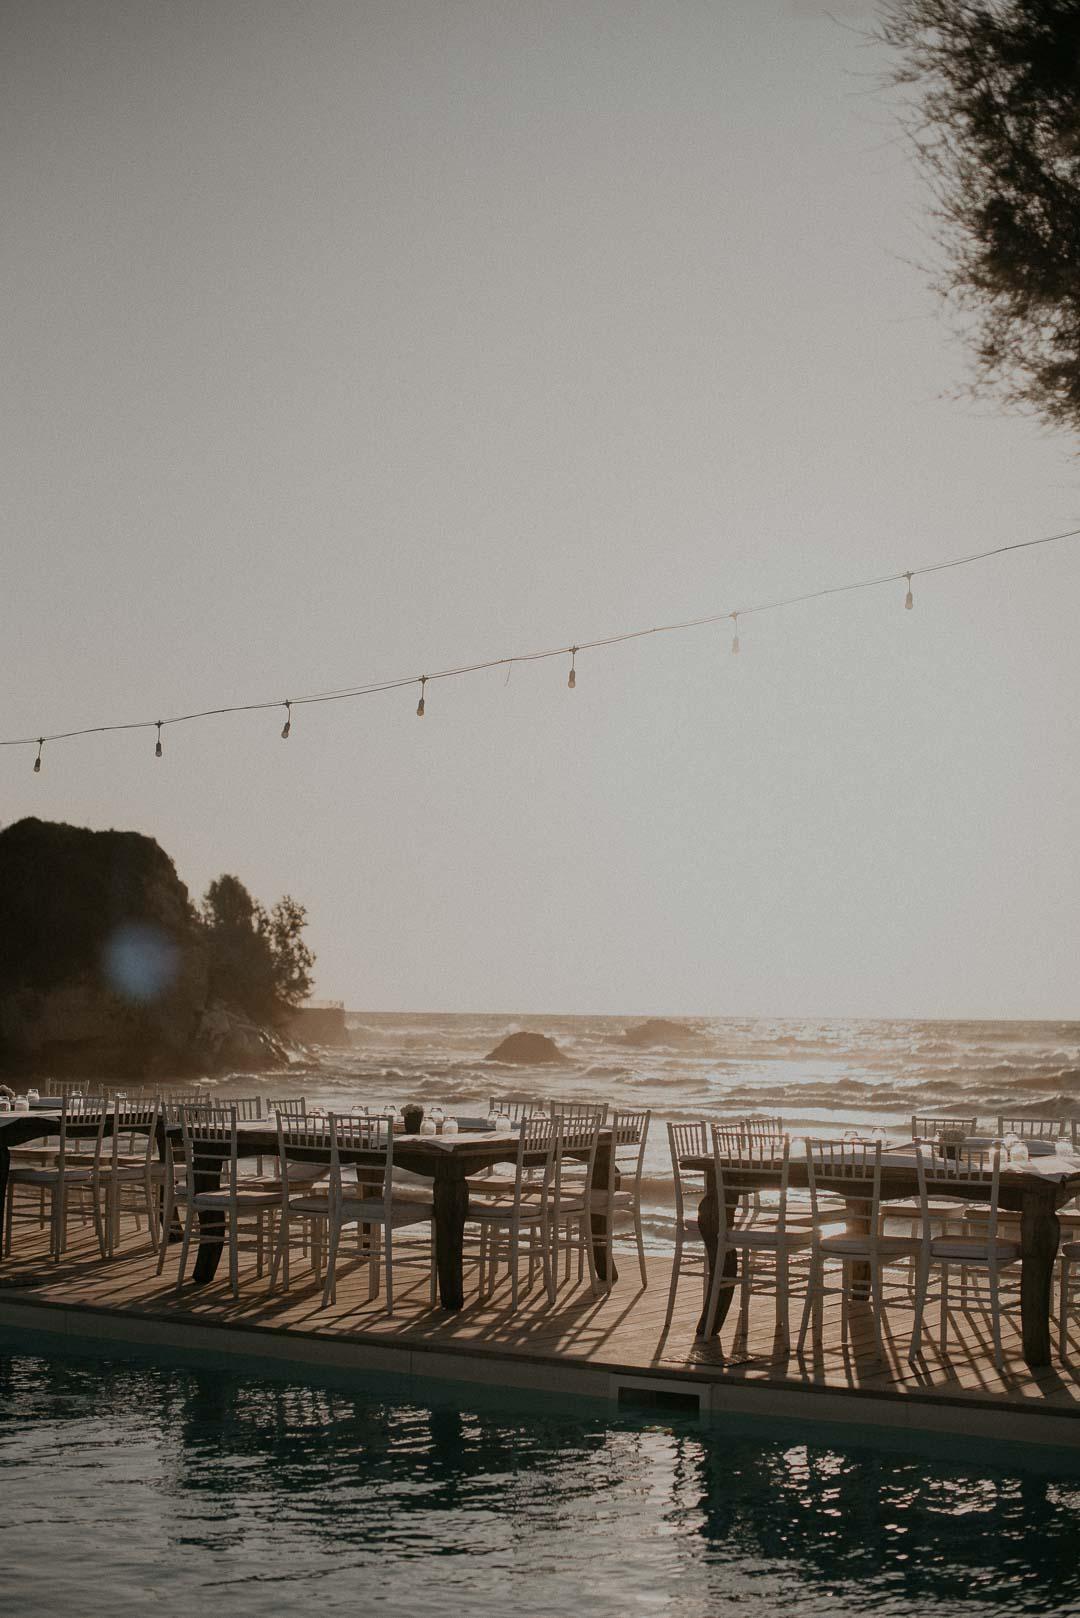 wedding-photographer-destination-fineart-bespoke-reportage-napoli-nabilah-vivianeizzo-spazio46-87